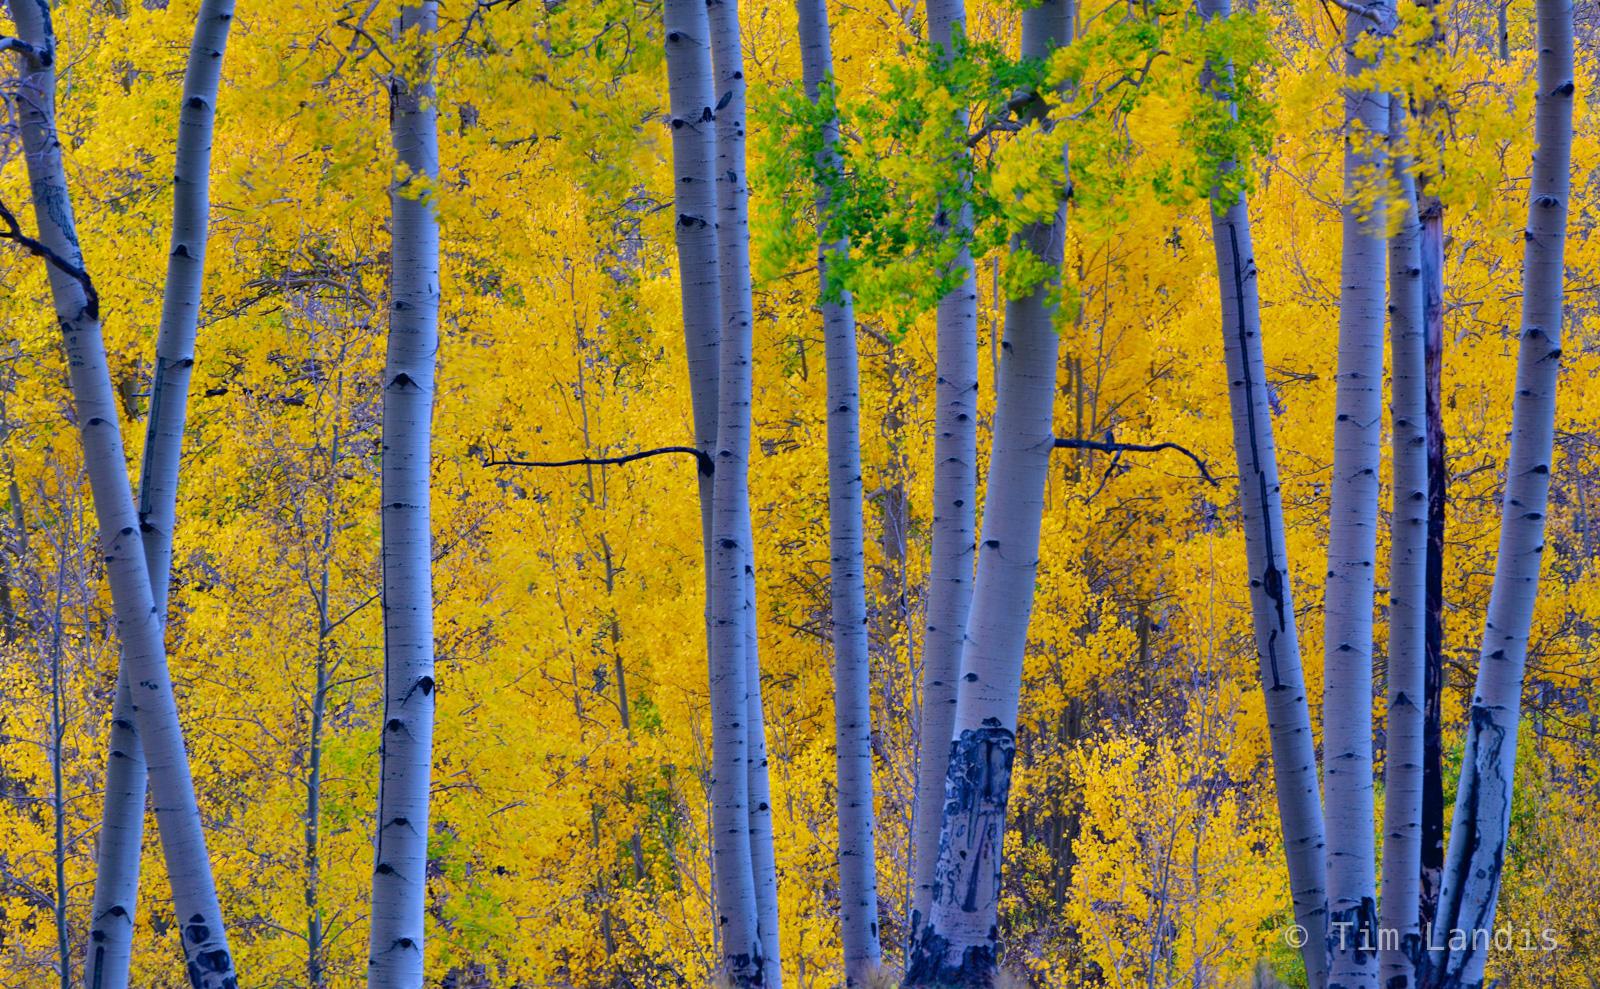 Purple trunks with golden aspens, bare aspens trees, photo